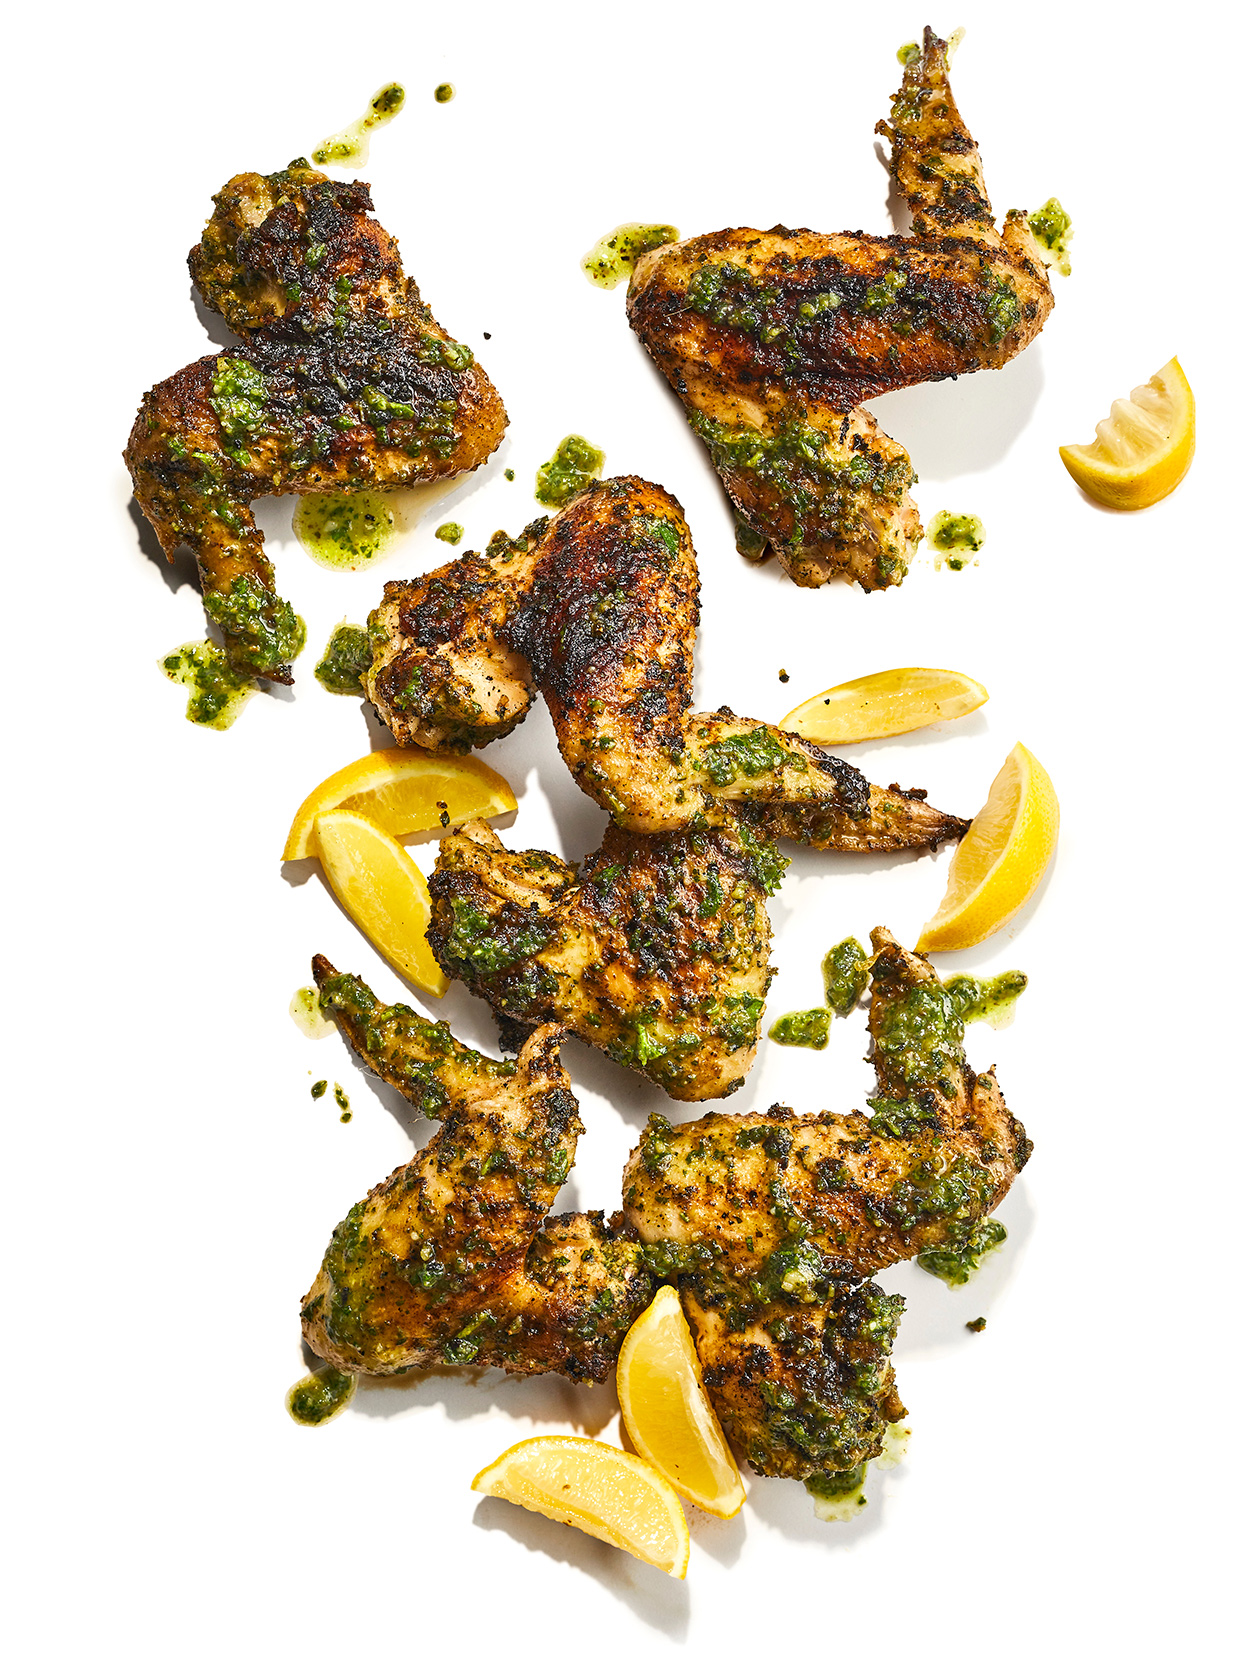 Grilled Pesto Wings lemon slices